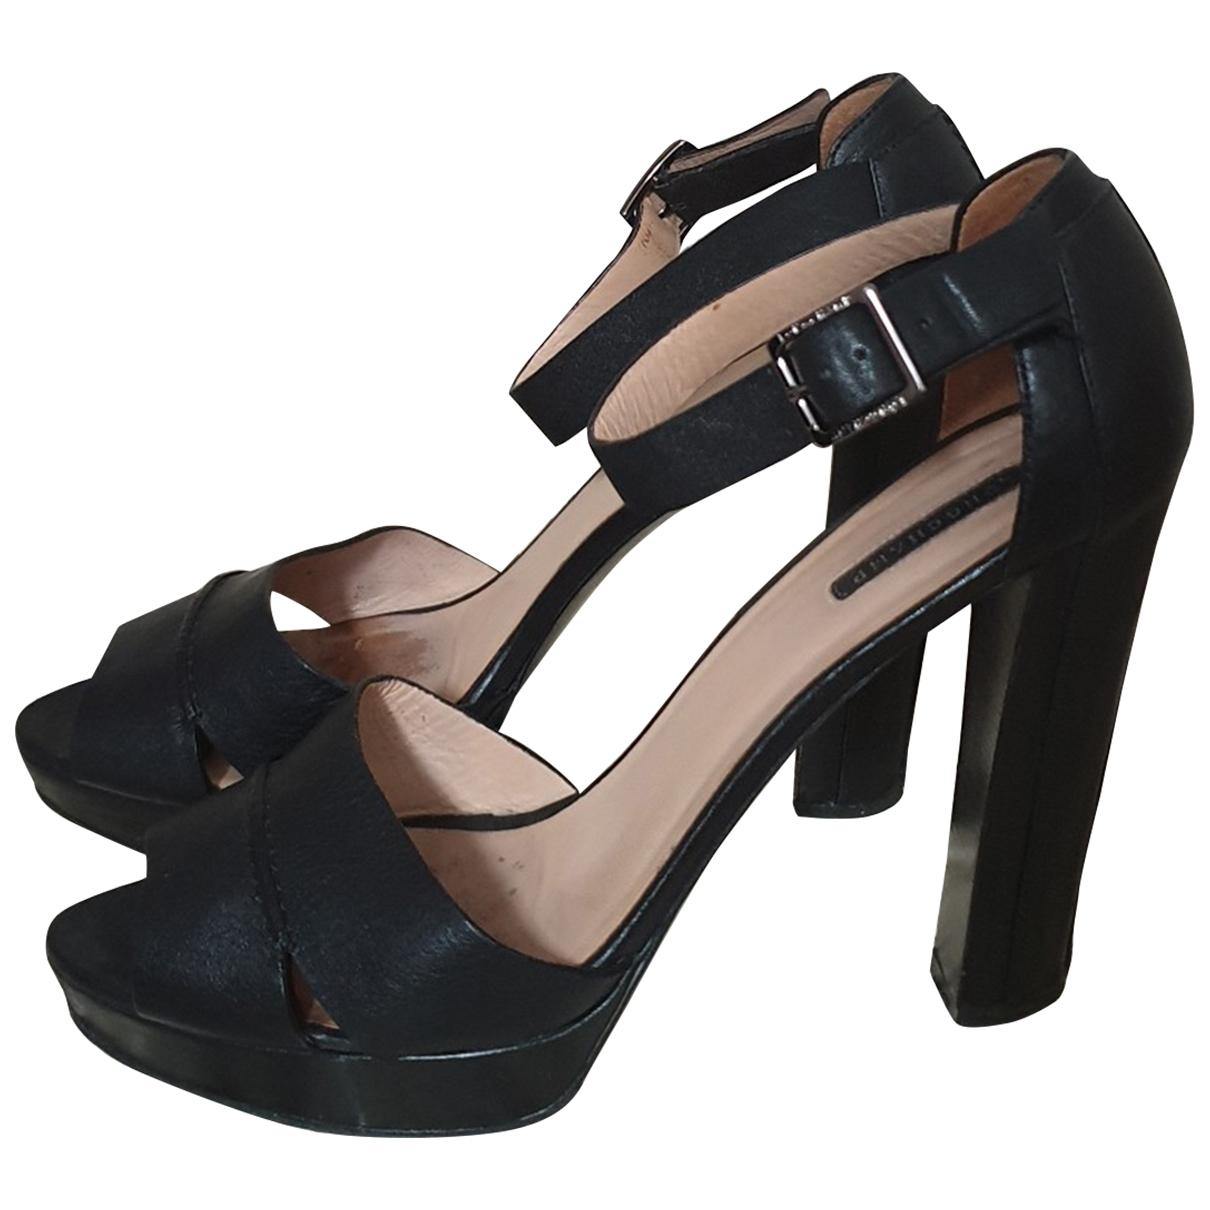 Longchamp \N Black Leather Sandals for Women 40 EU